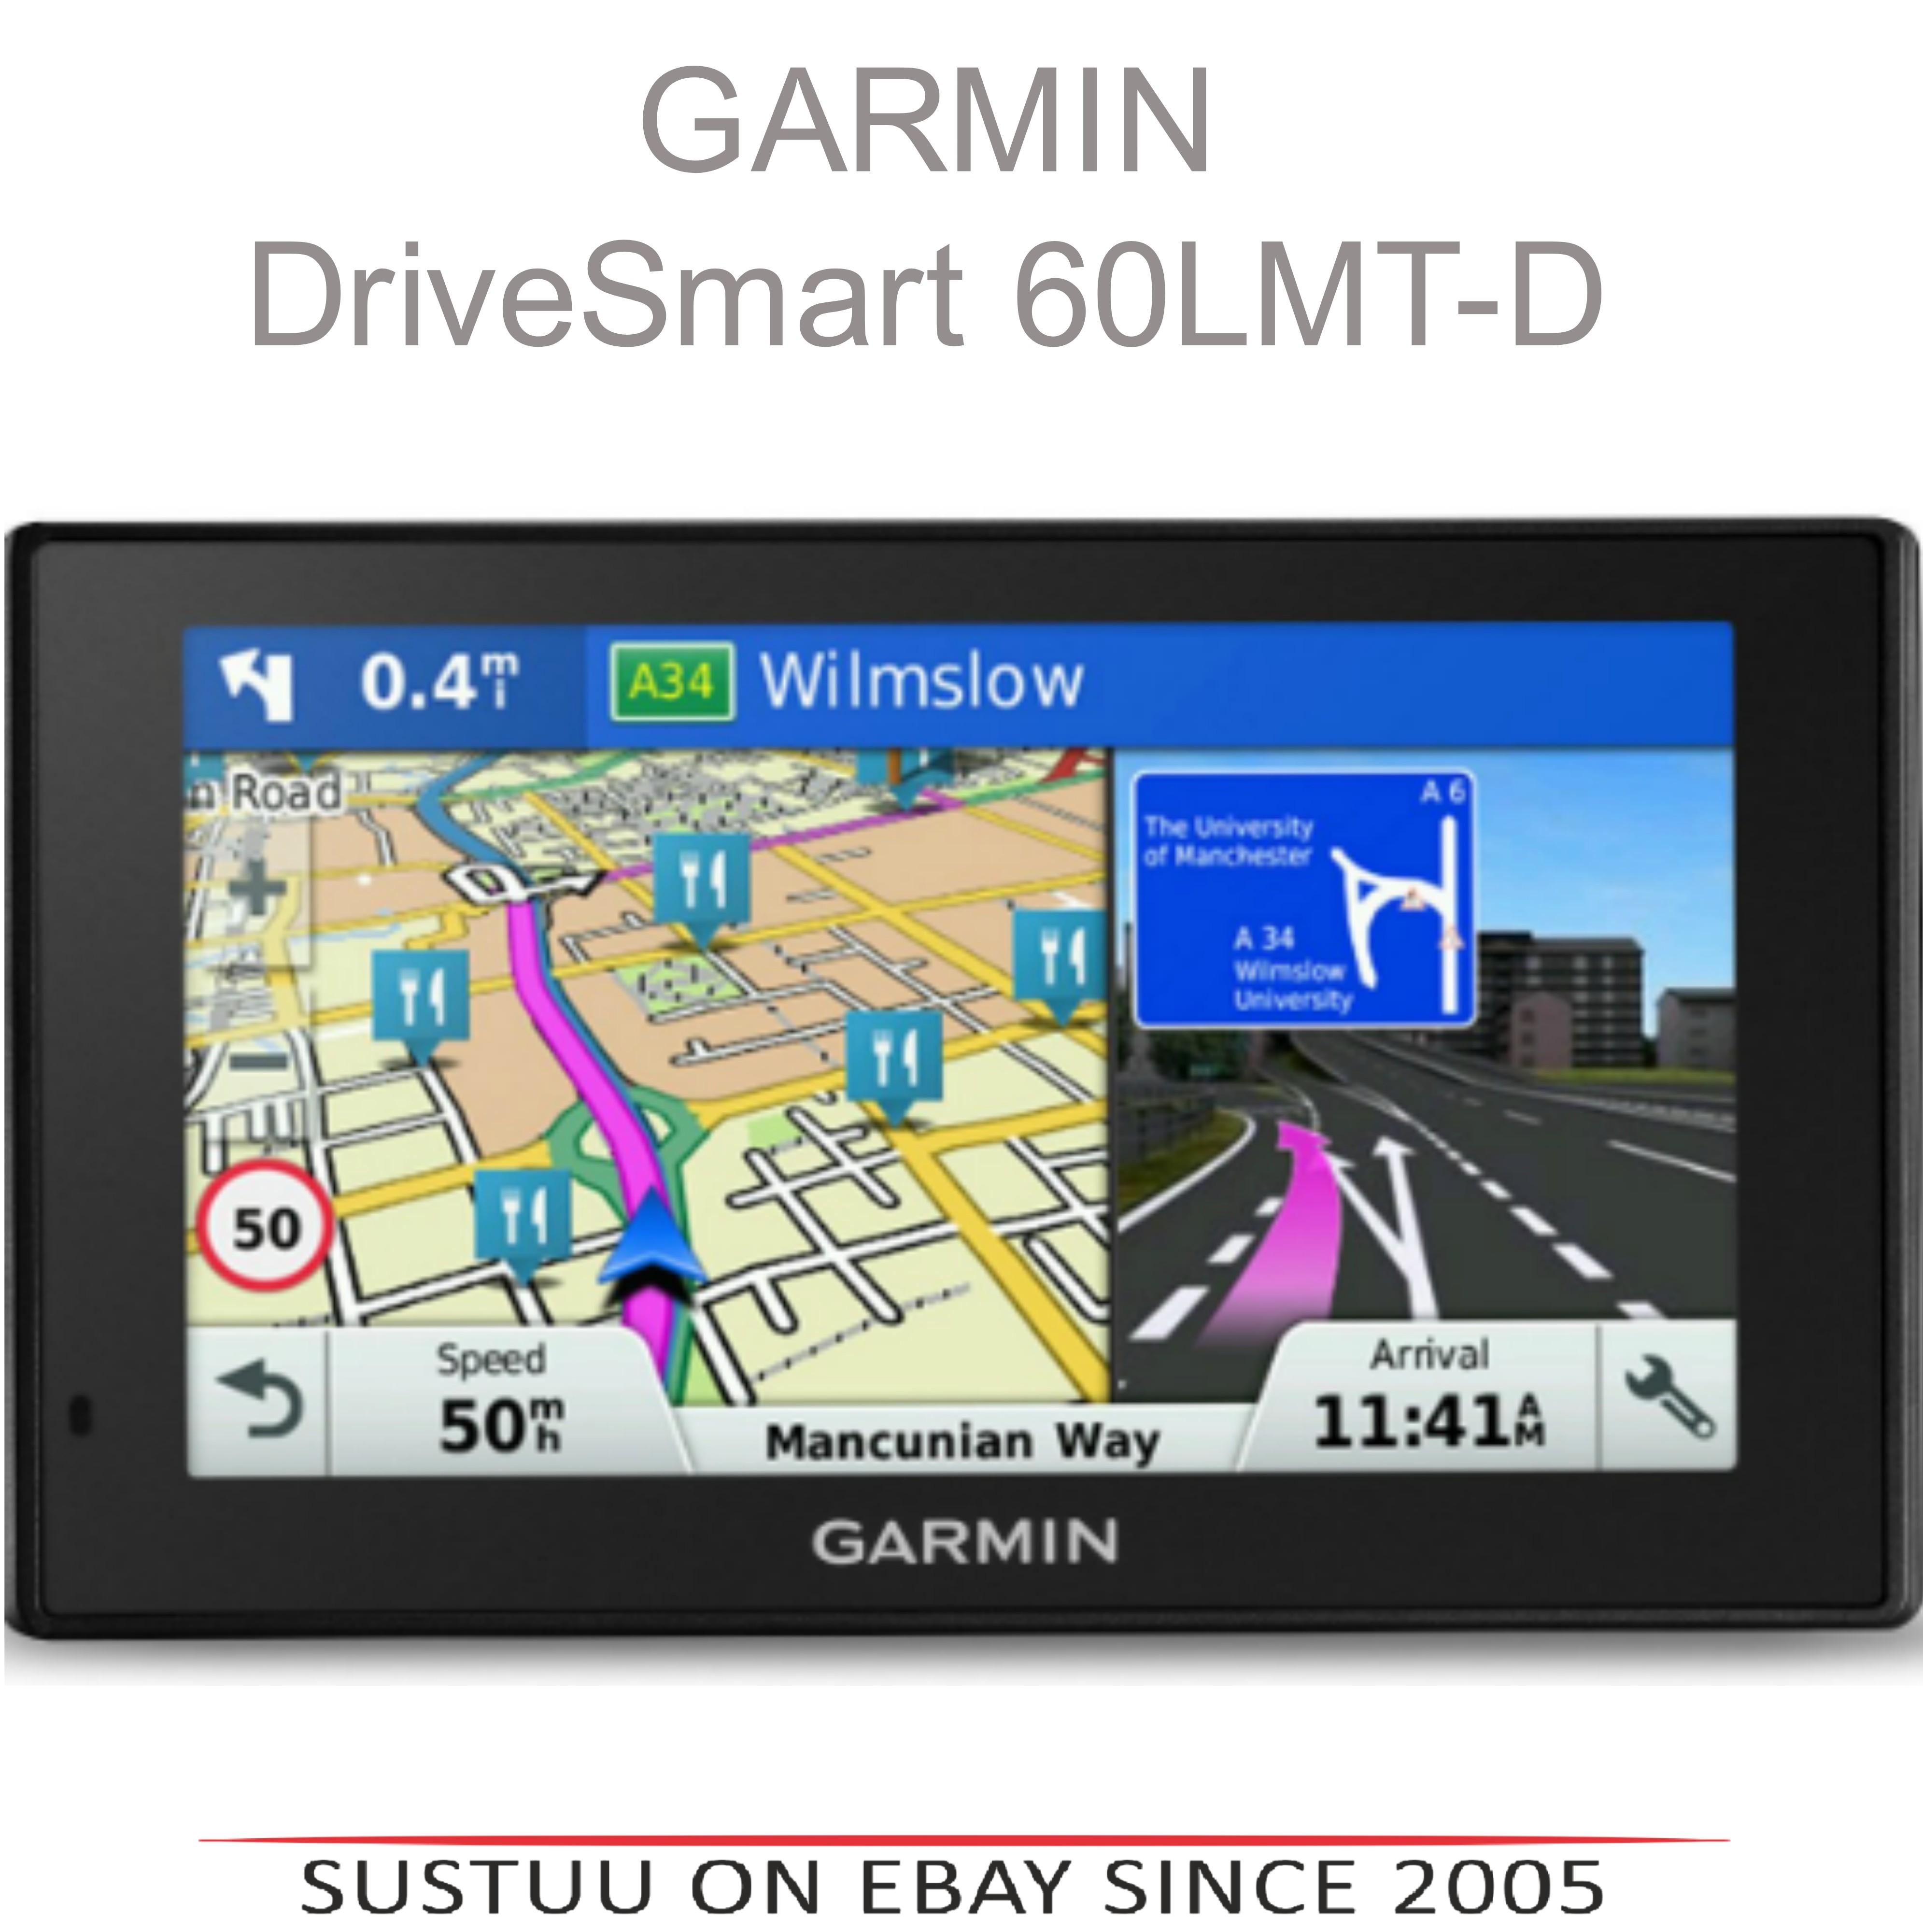 "Garmin DriveSmart 60LMT-D|6"" GPS SatNav|Bluetooth|Lifetime UK-Europe Map+Traffic"